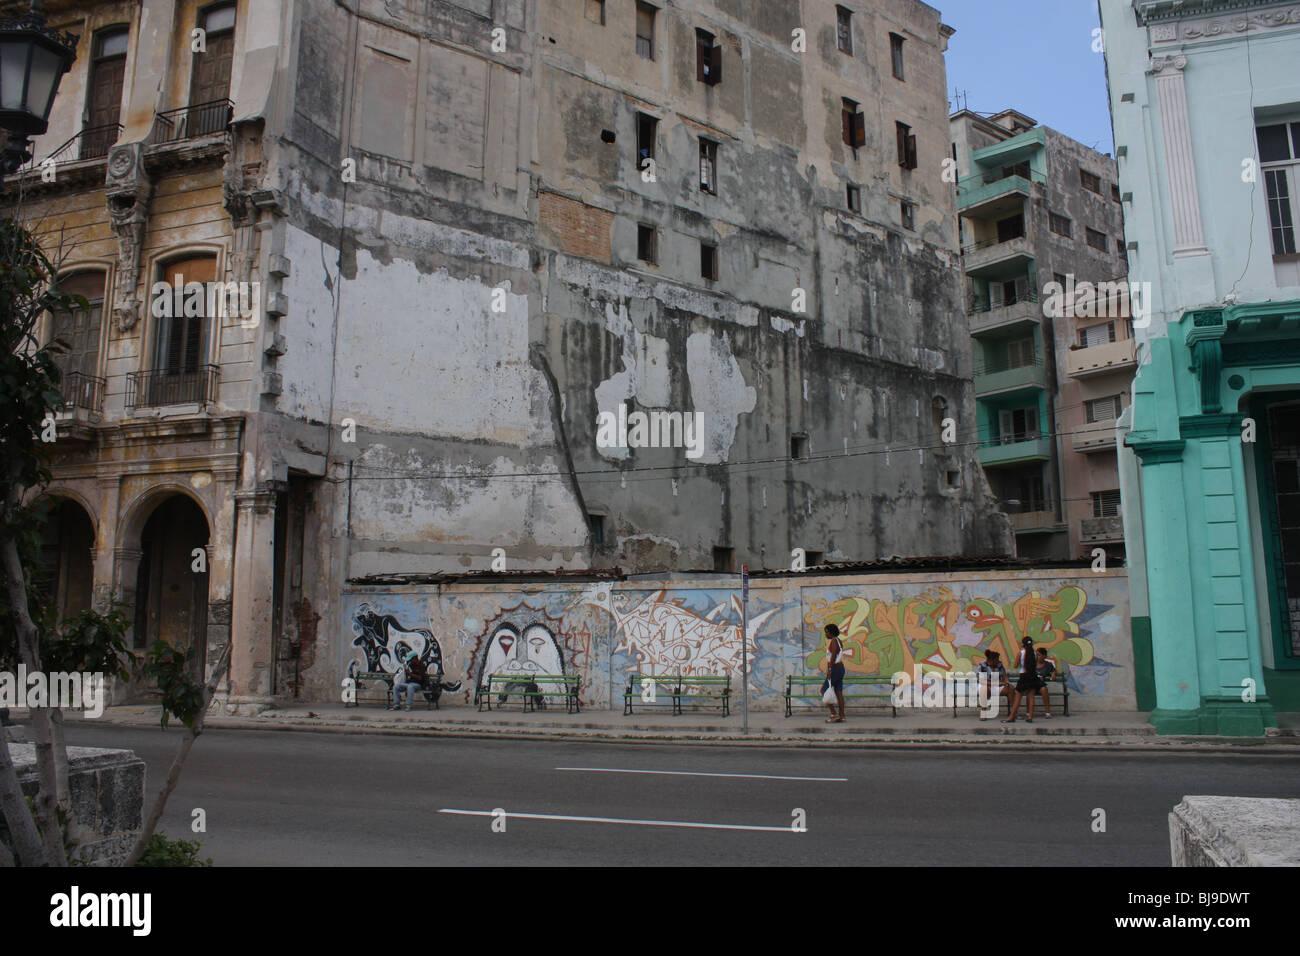 Decaying building in Havana - Stock Image